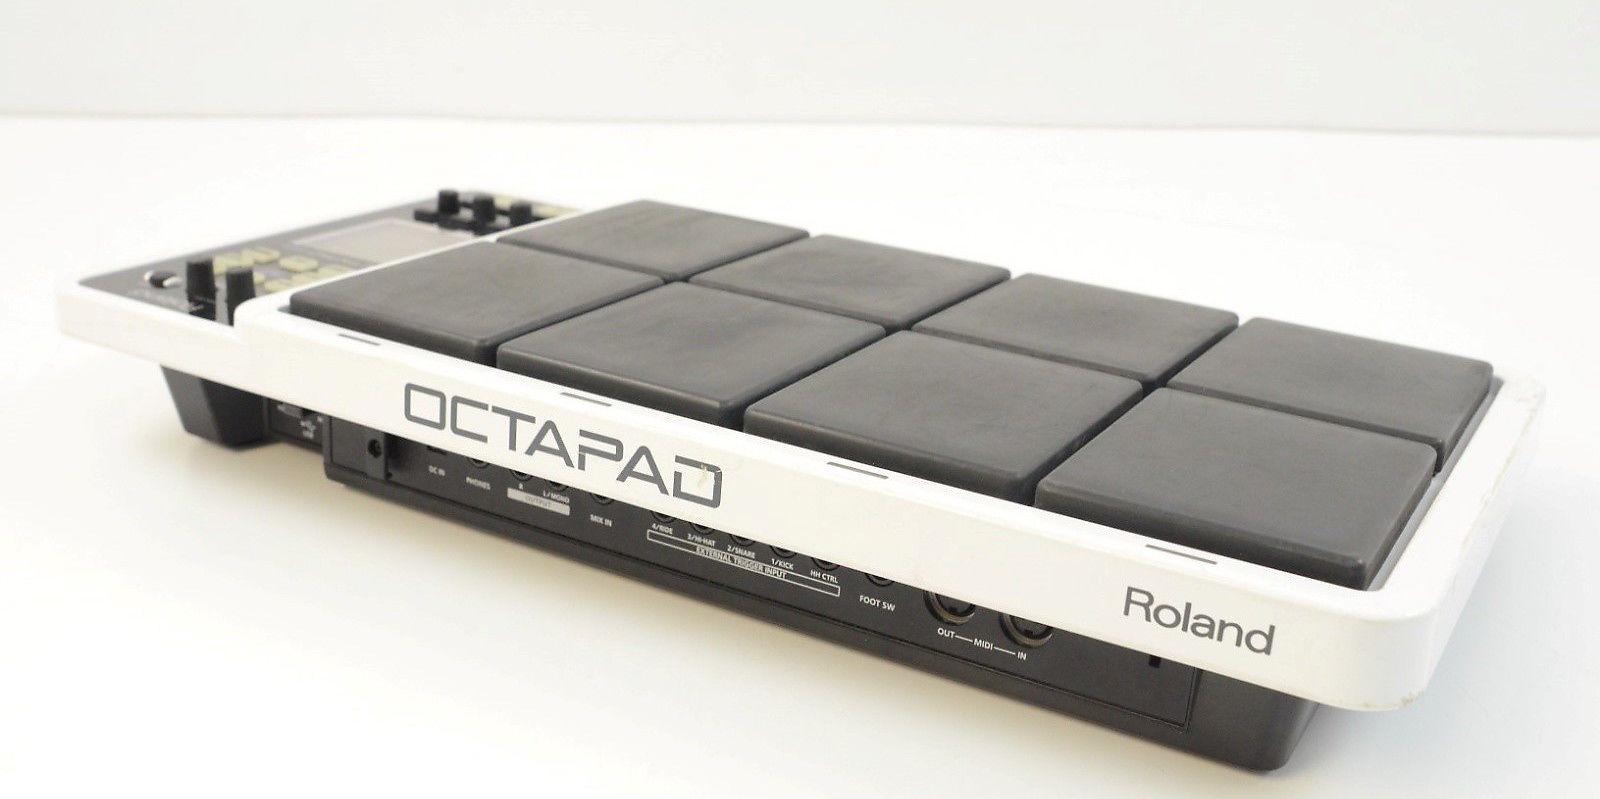 roland octapad spd 30 8 zone digital percussion pad white reverb. Black Bedroom Furniture Sets. Home Design Ideas